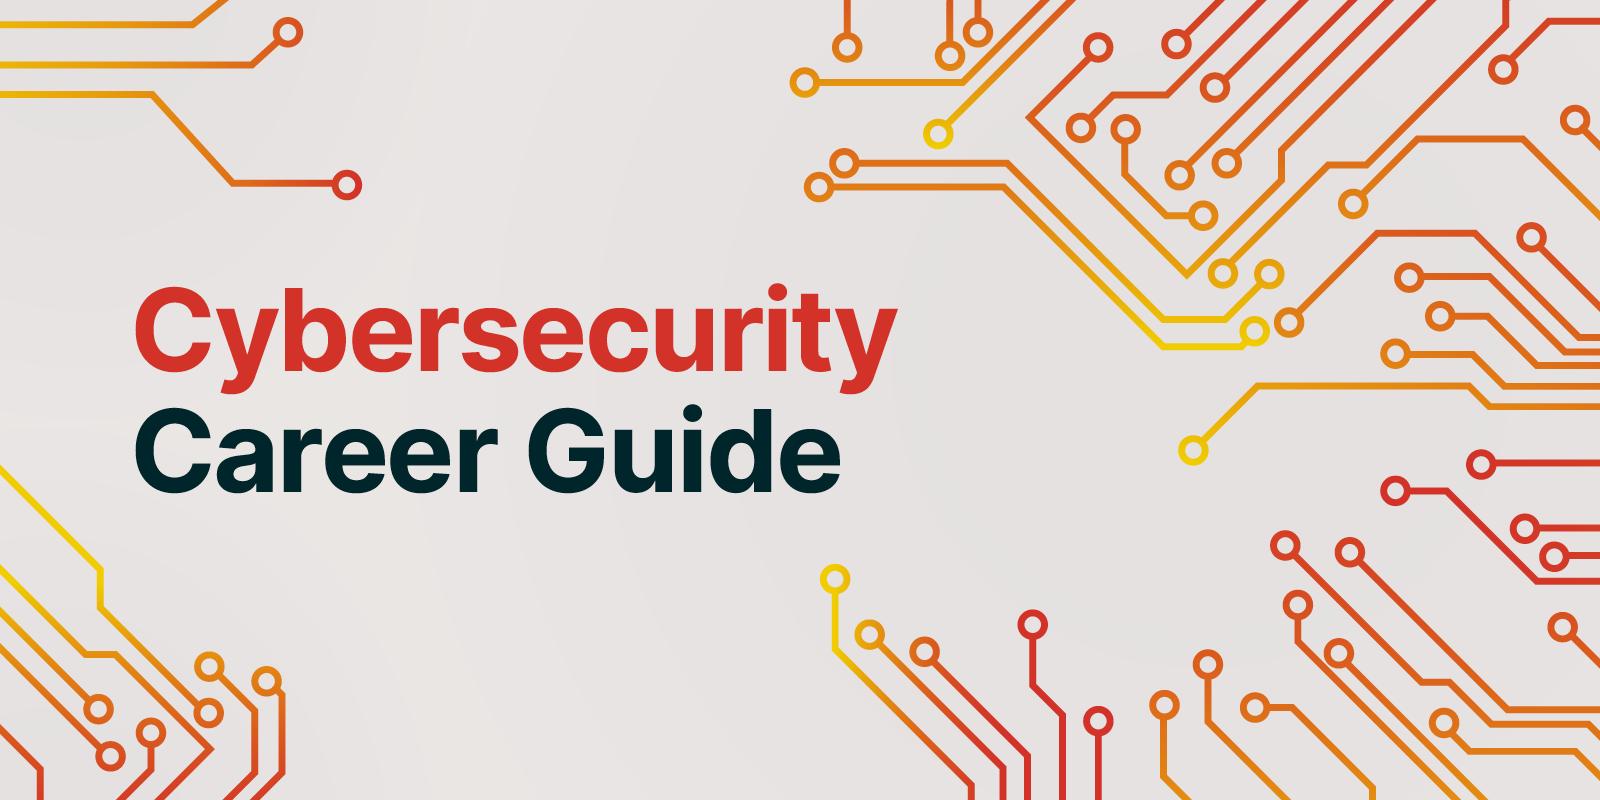 cybsersecurity career guide